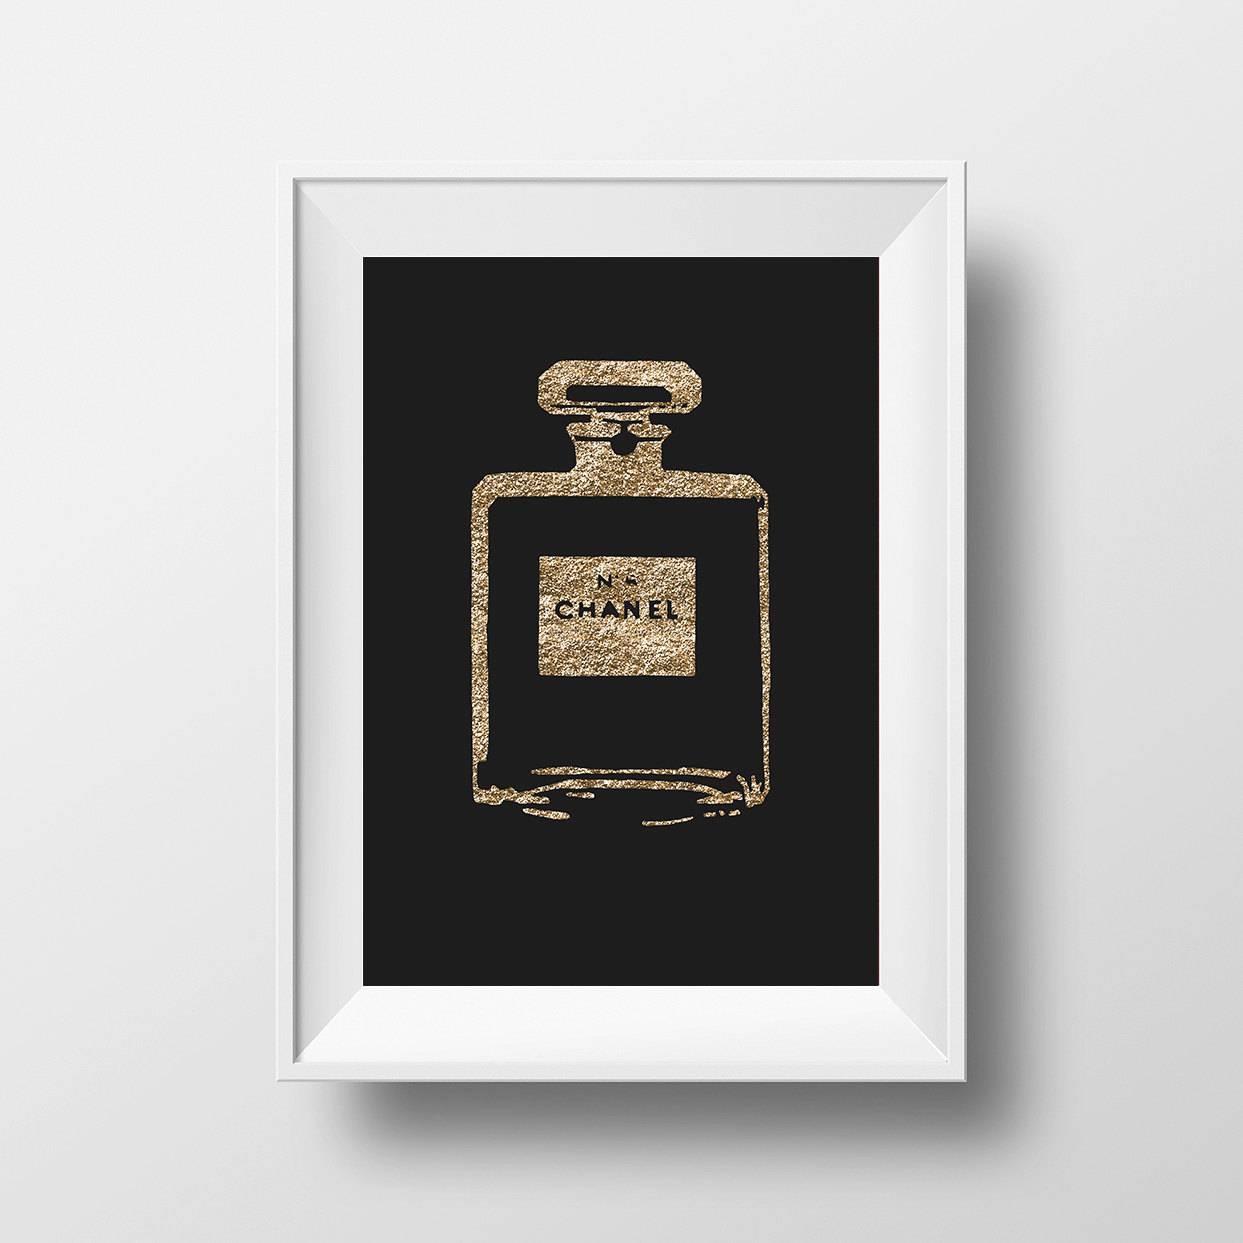 Charming Chanel Perfume Wall Art Uk Chanel Wall Art A Coco Chanel Within 2017 Chanel Wall Decor (View 5 of 25)